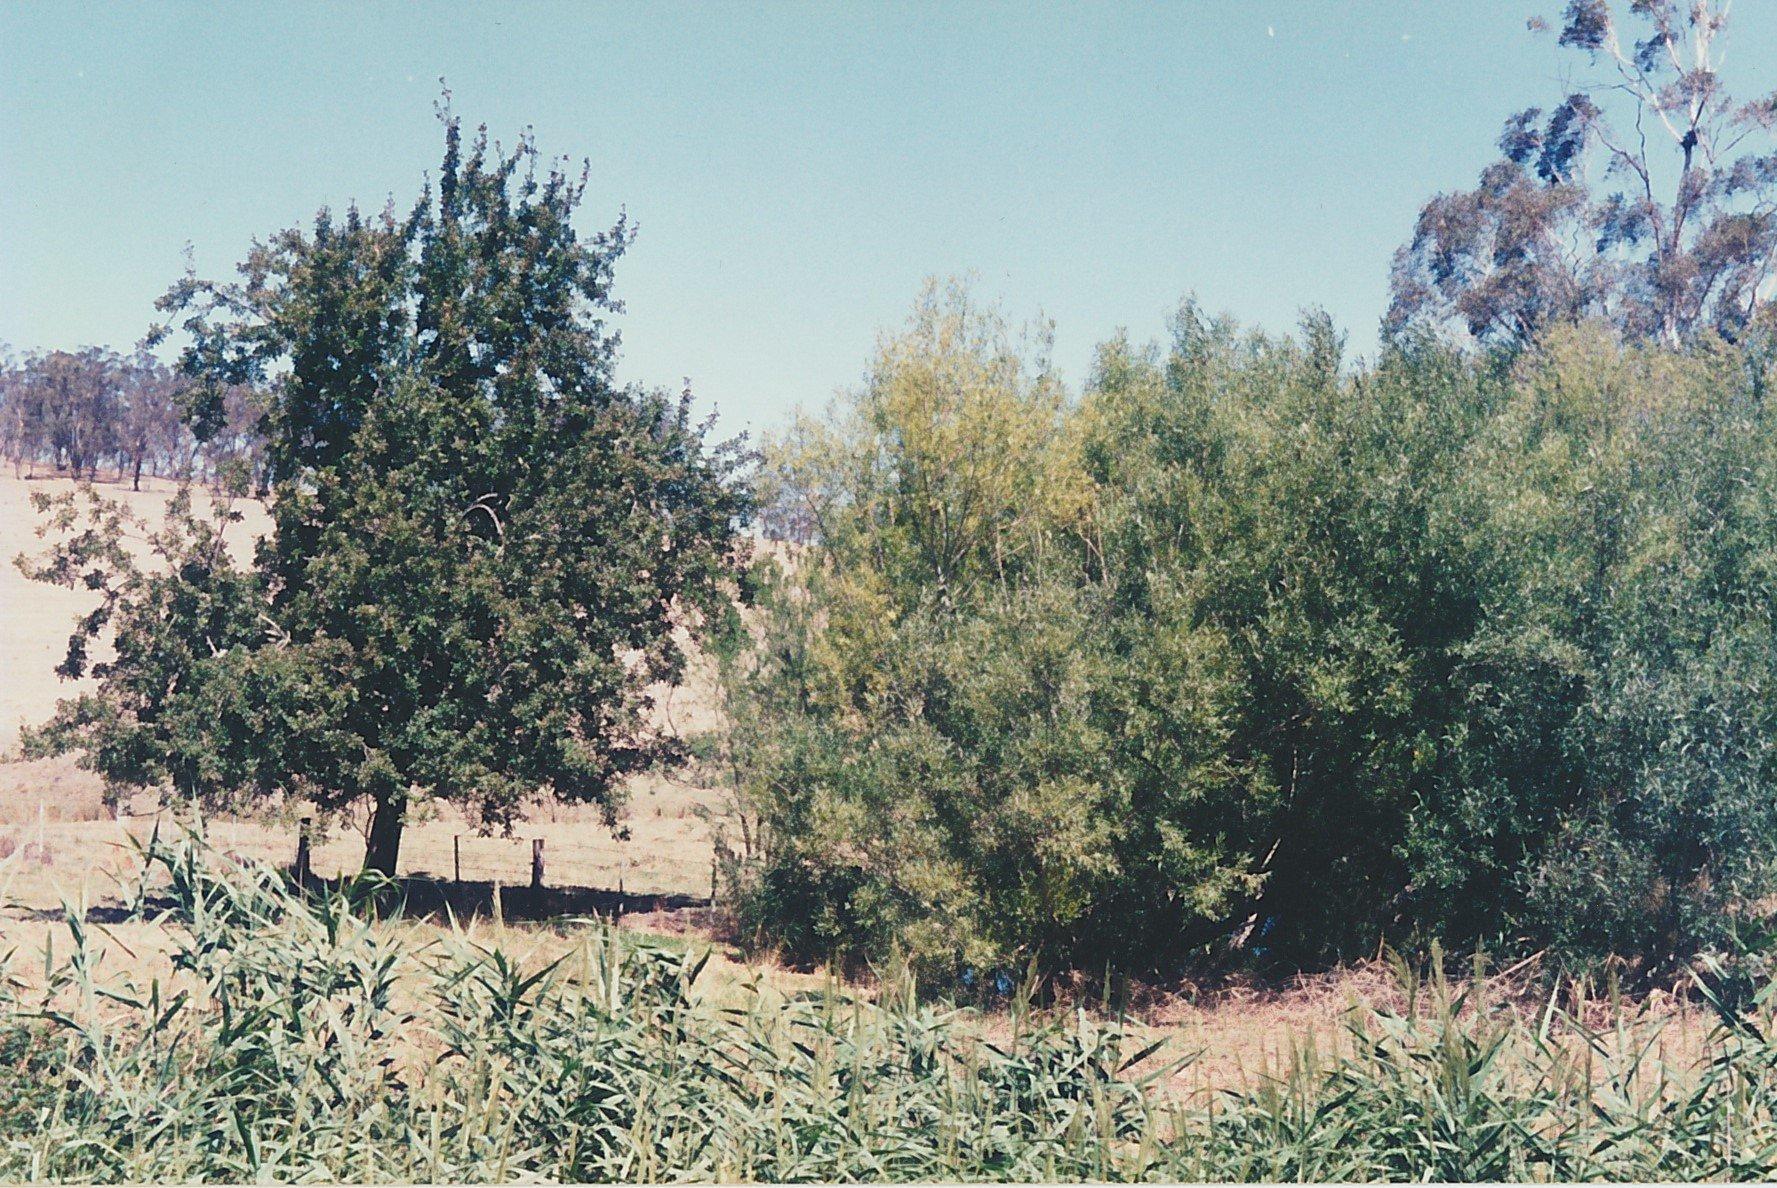 Pear tree near Running Creek above 'Charnwood', Arthurs Creek.  Bruce G. Draper, November 2003